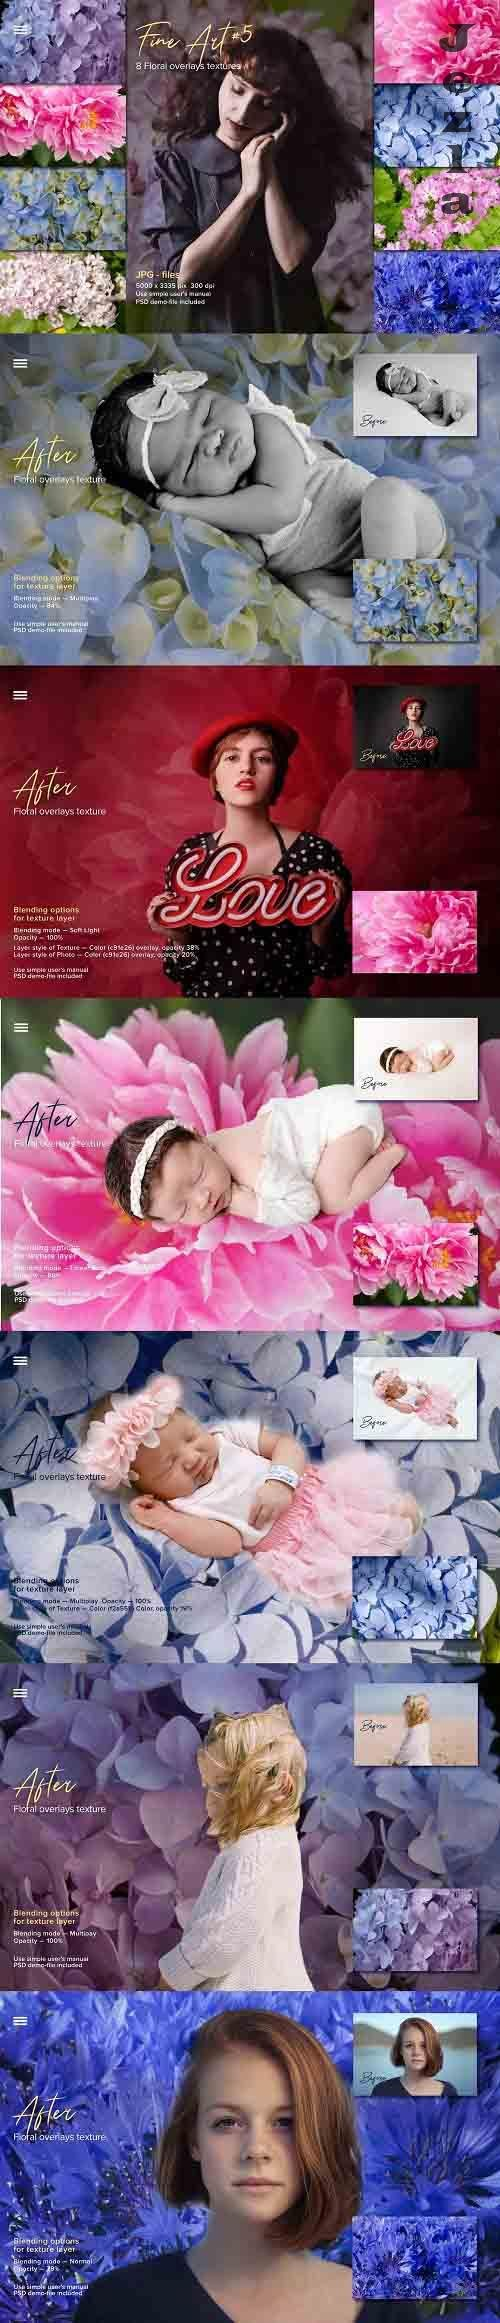 Fine Art Floral Natural Textures #5 - 6084534